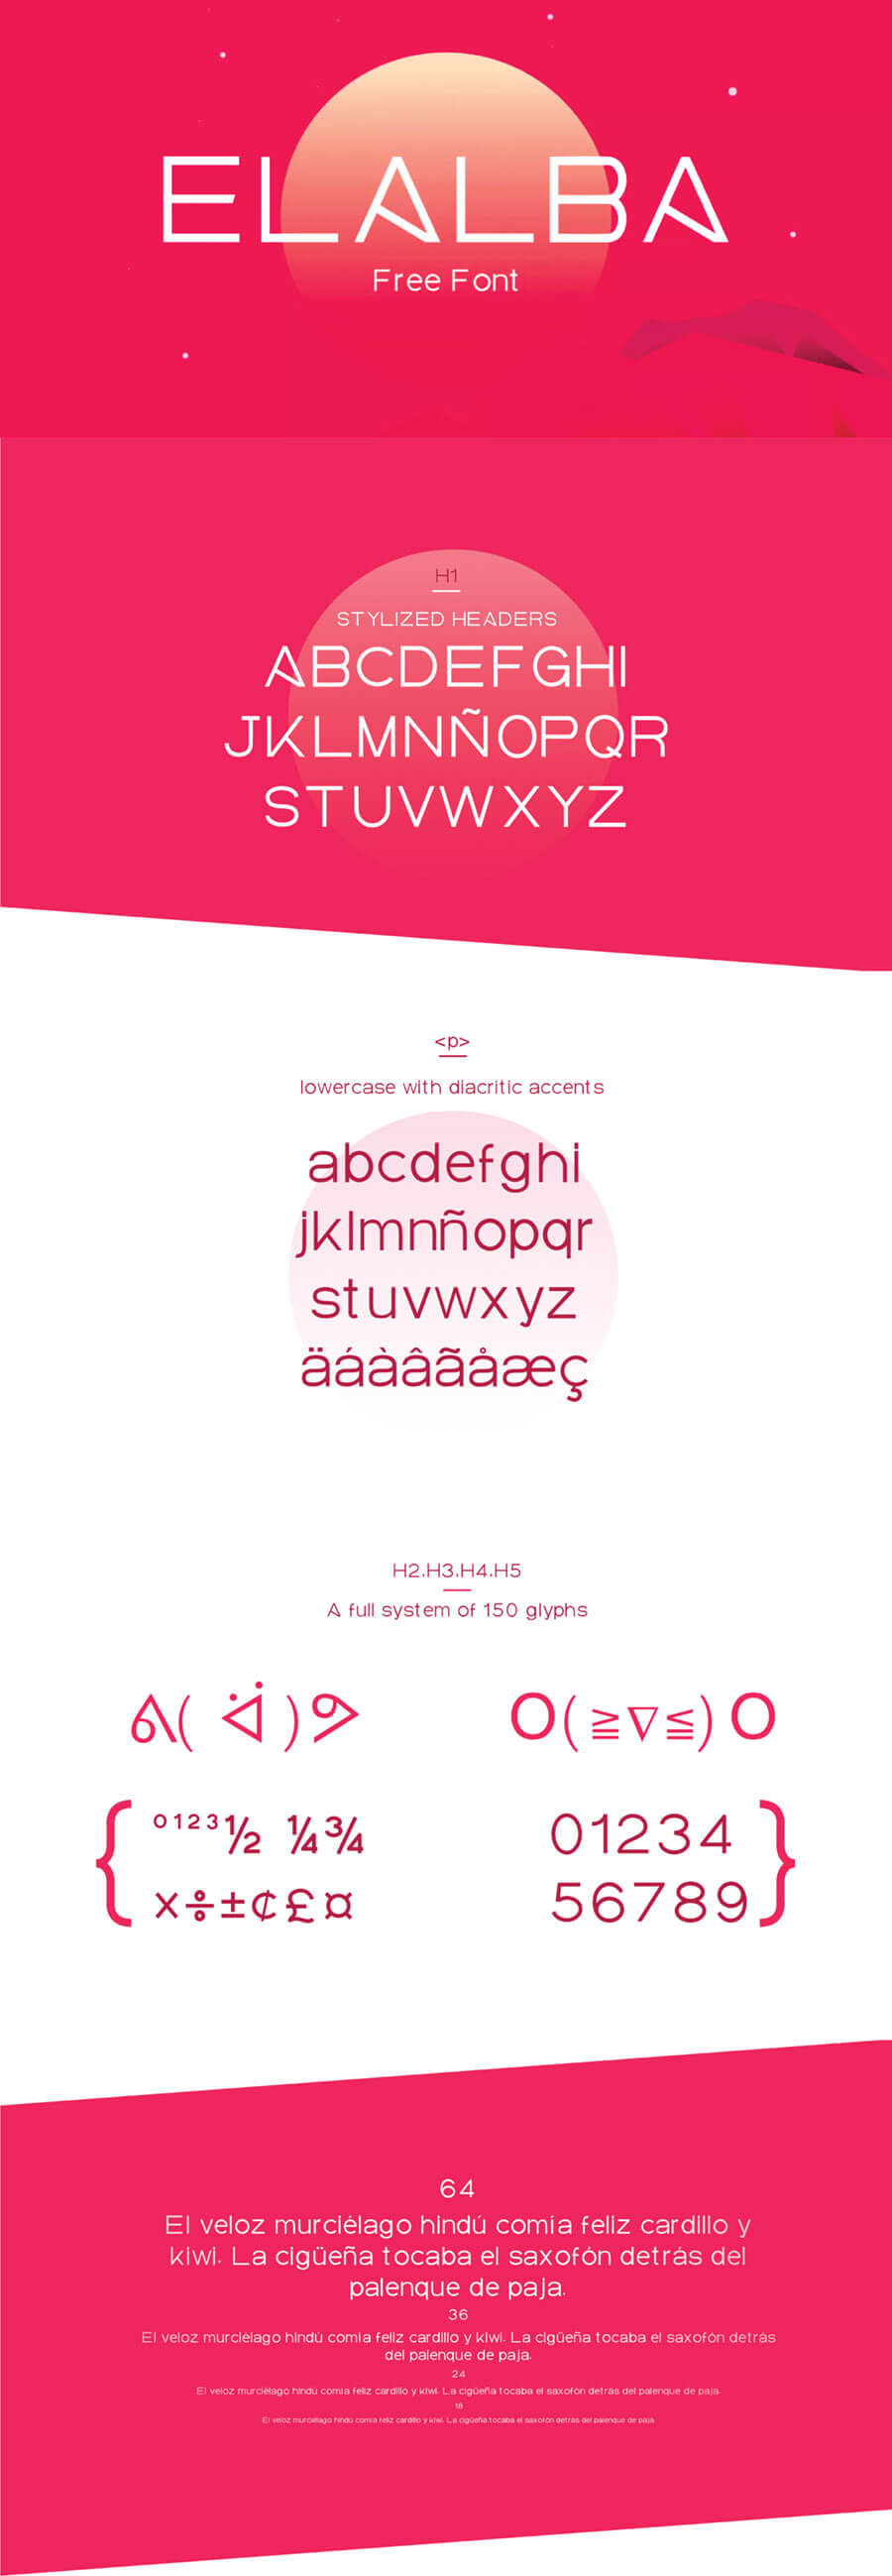 https://www.pixelsurplus.com/freebies/elalba-free-display-font